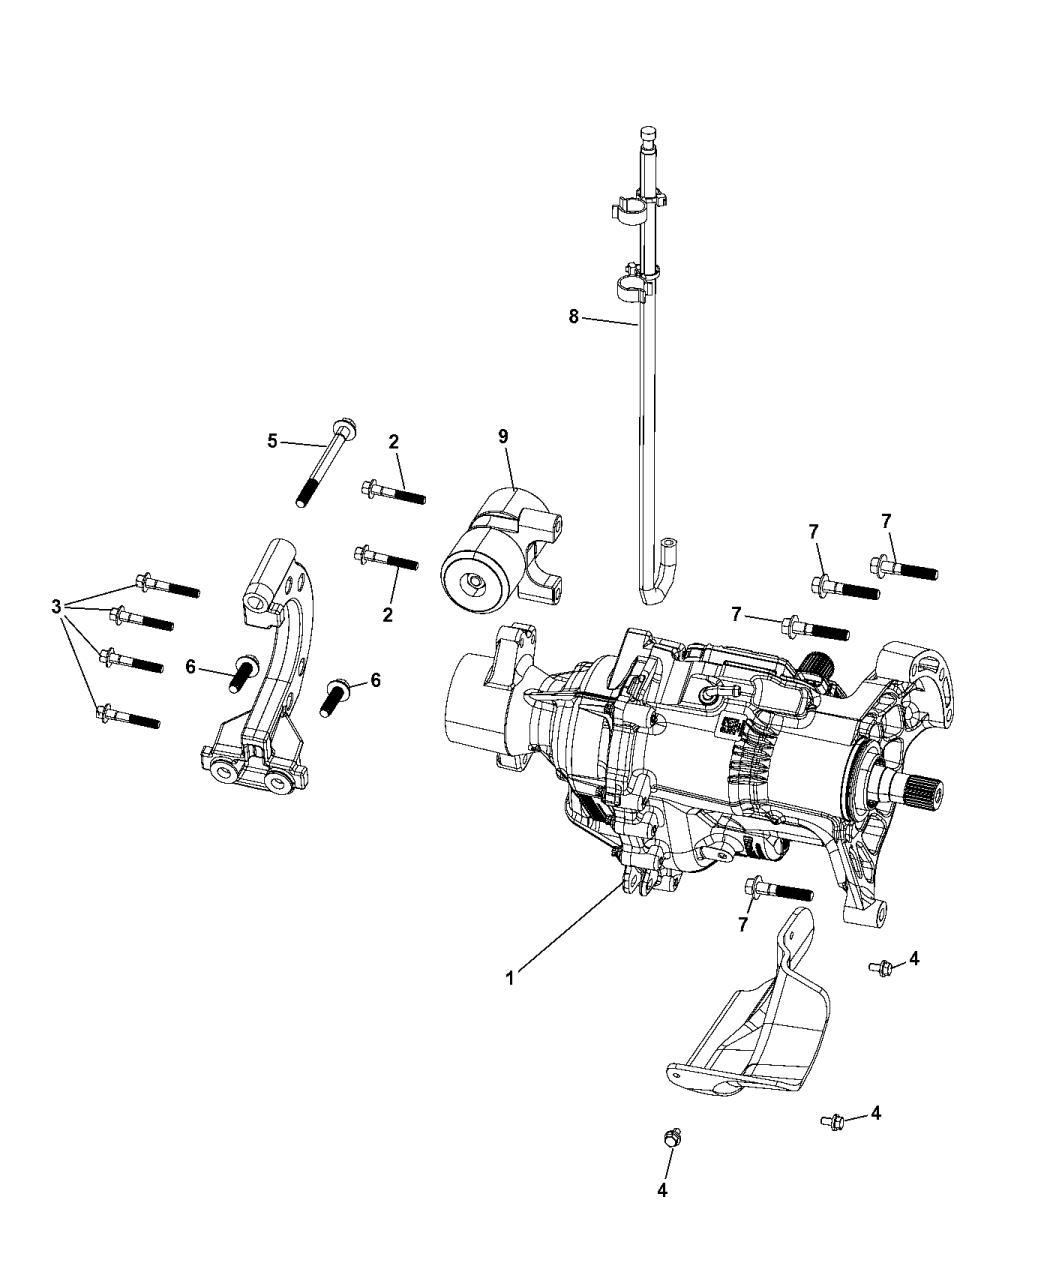 2014 Jeep Cherokee Power Transfer Unit - Mopar Parts Giant